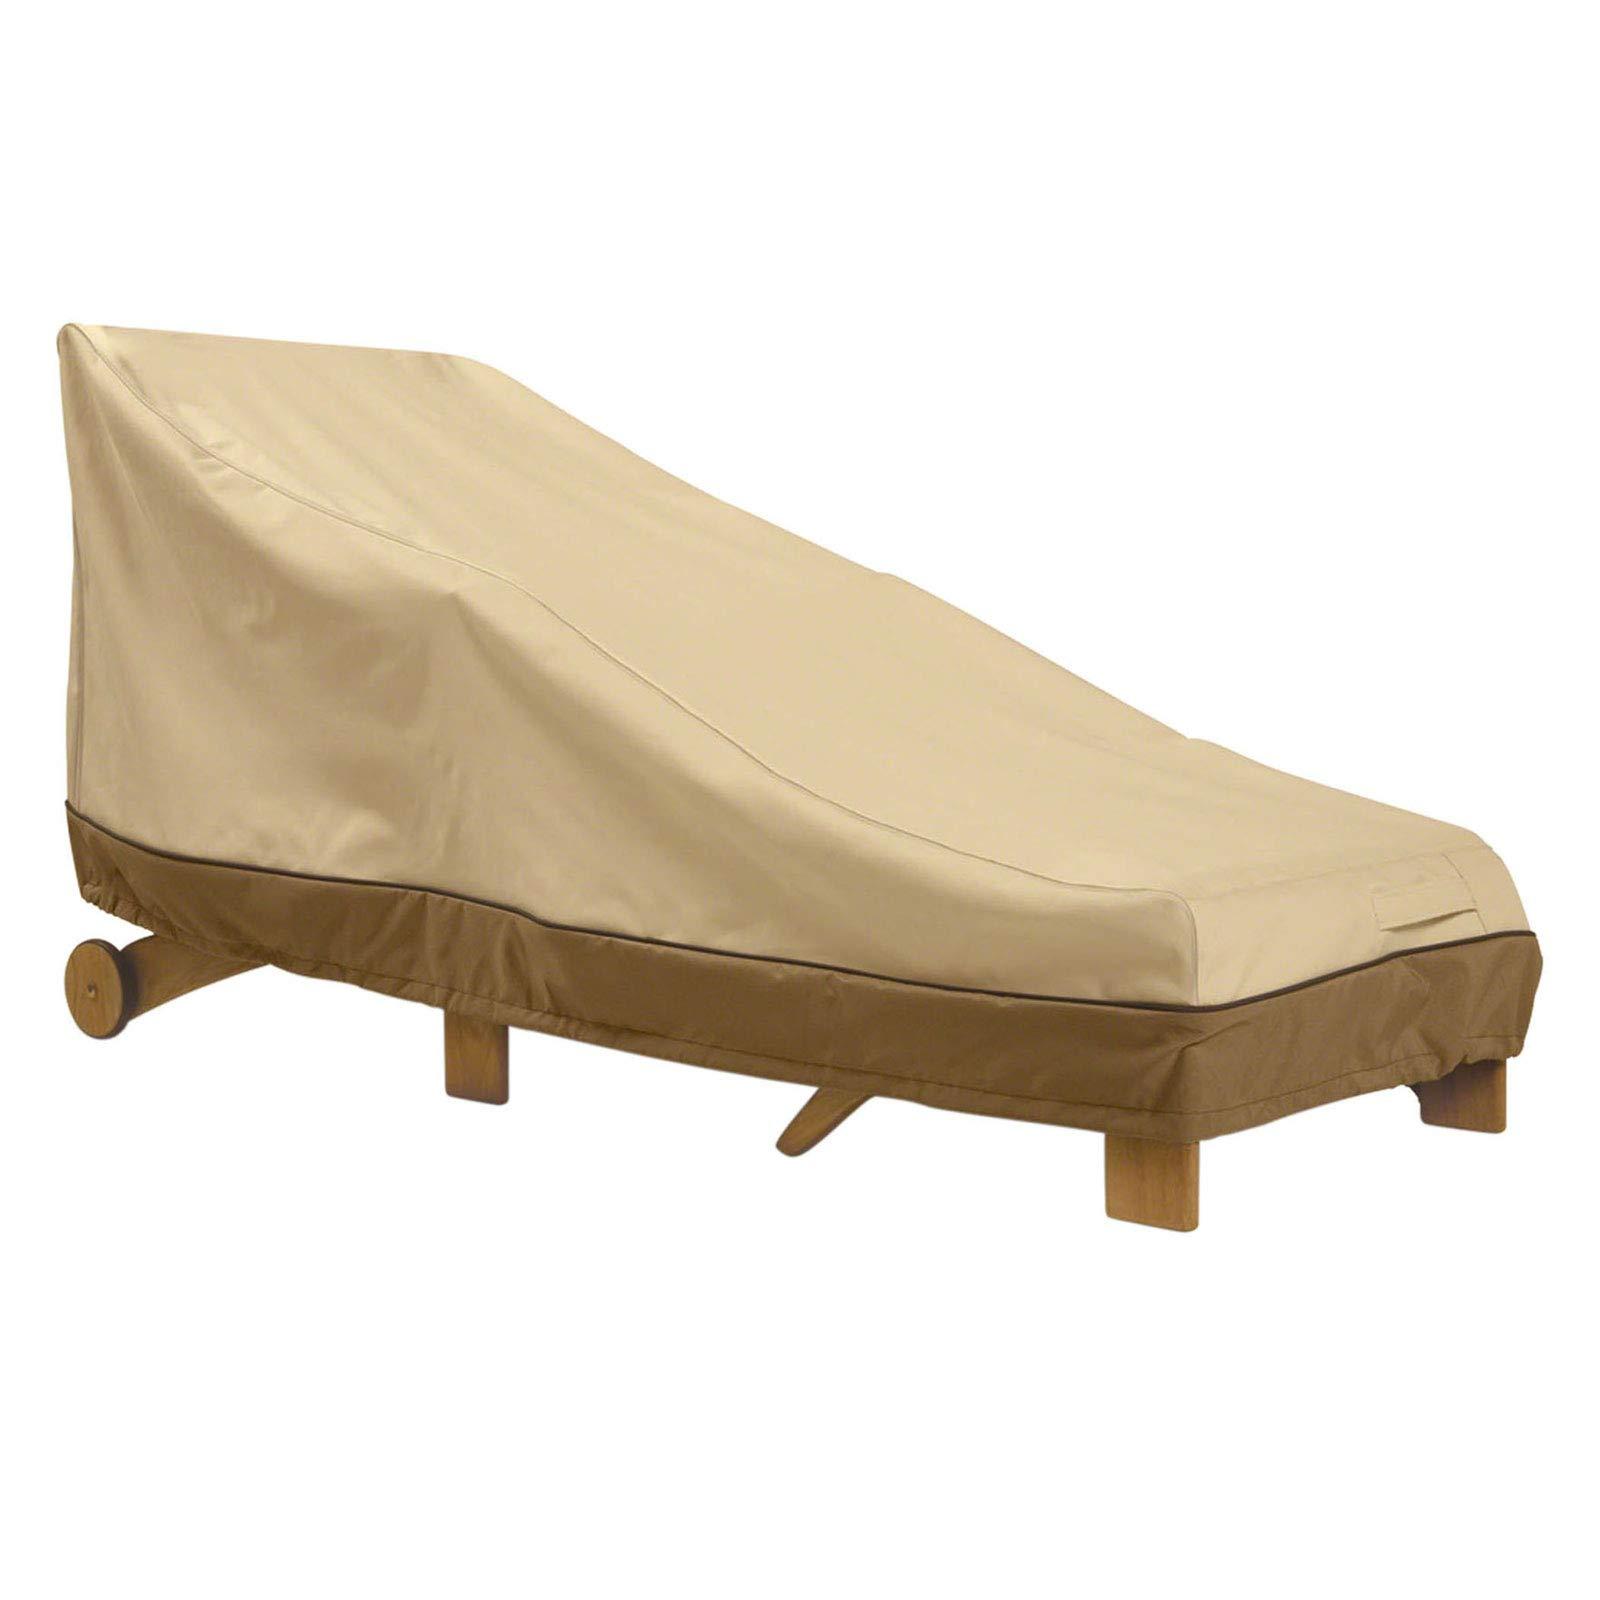 SKB family Chaise Lounge Cover - Veranda, 28'' x 27.5'' x 66'' x 7 lbs, Small